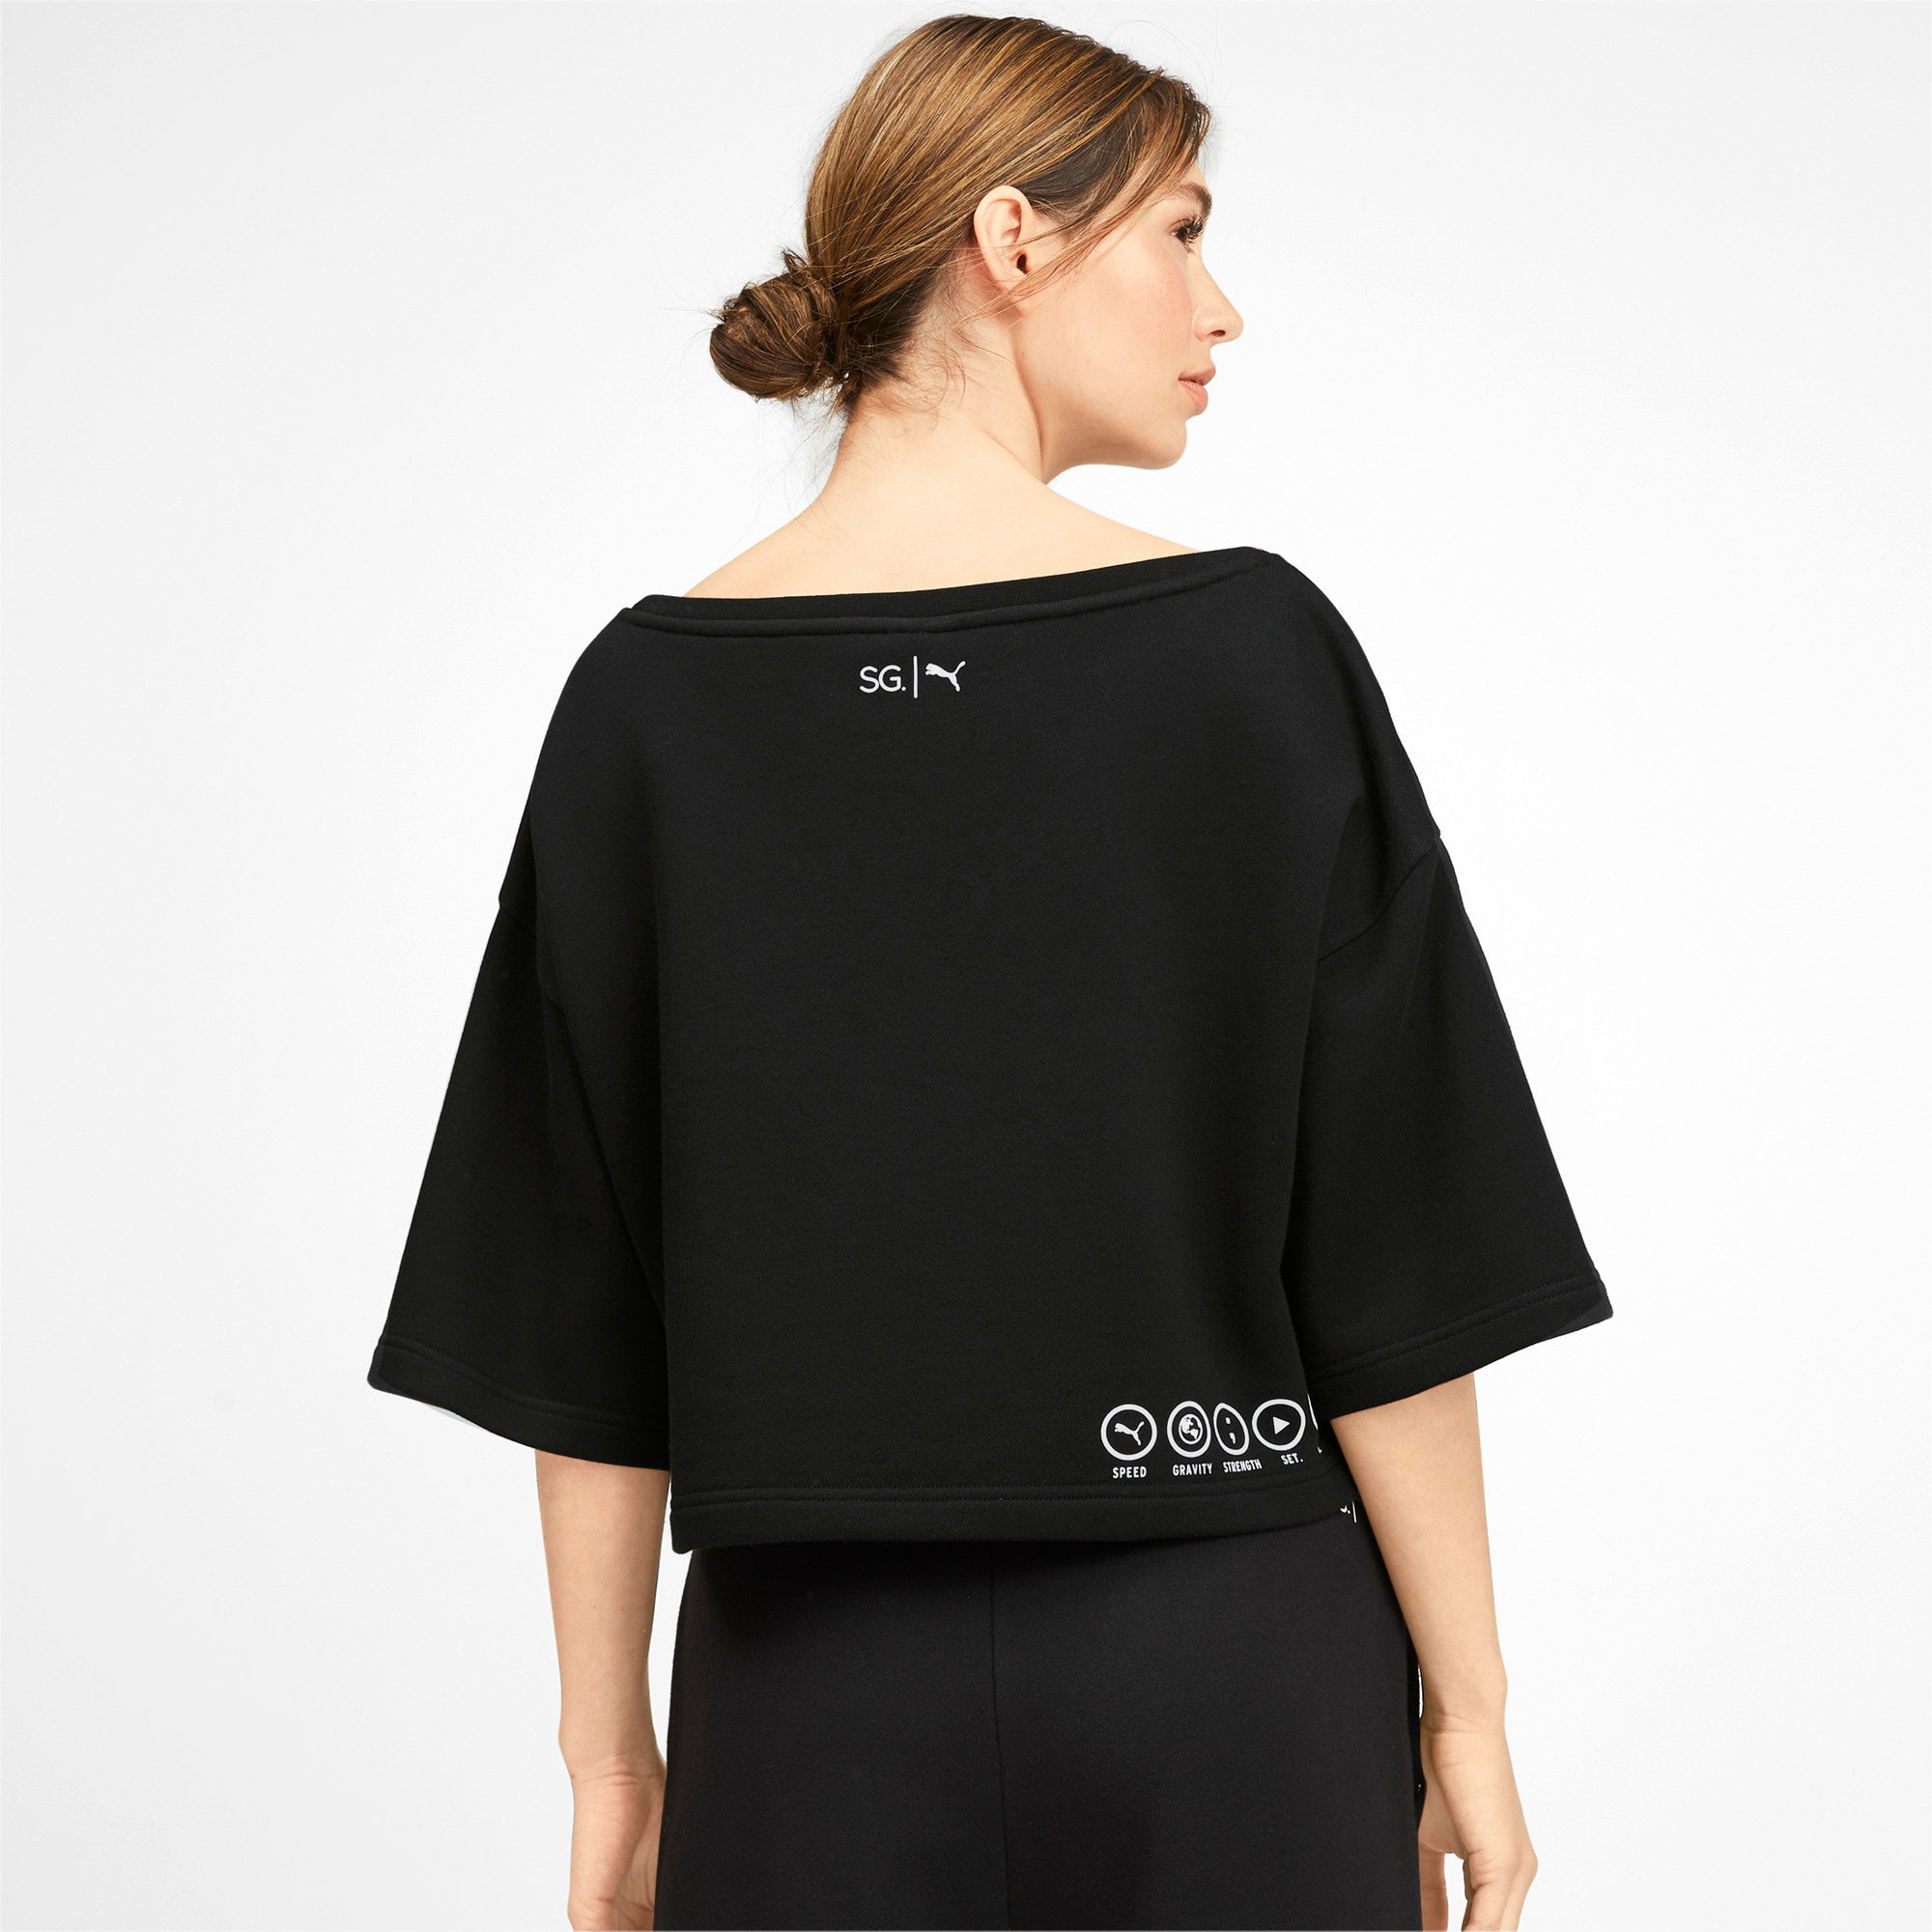 Thumbnail 2 of PUMA x SELENA GOMEZ Cropped Short Sleeve Women's Sweater, Puma Black, medium